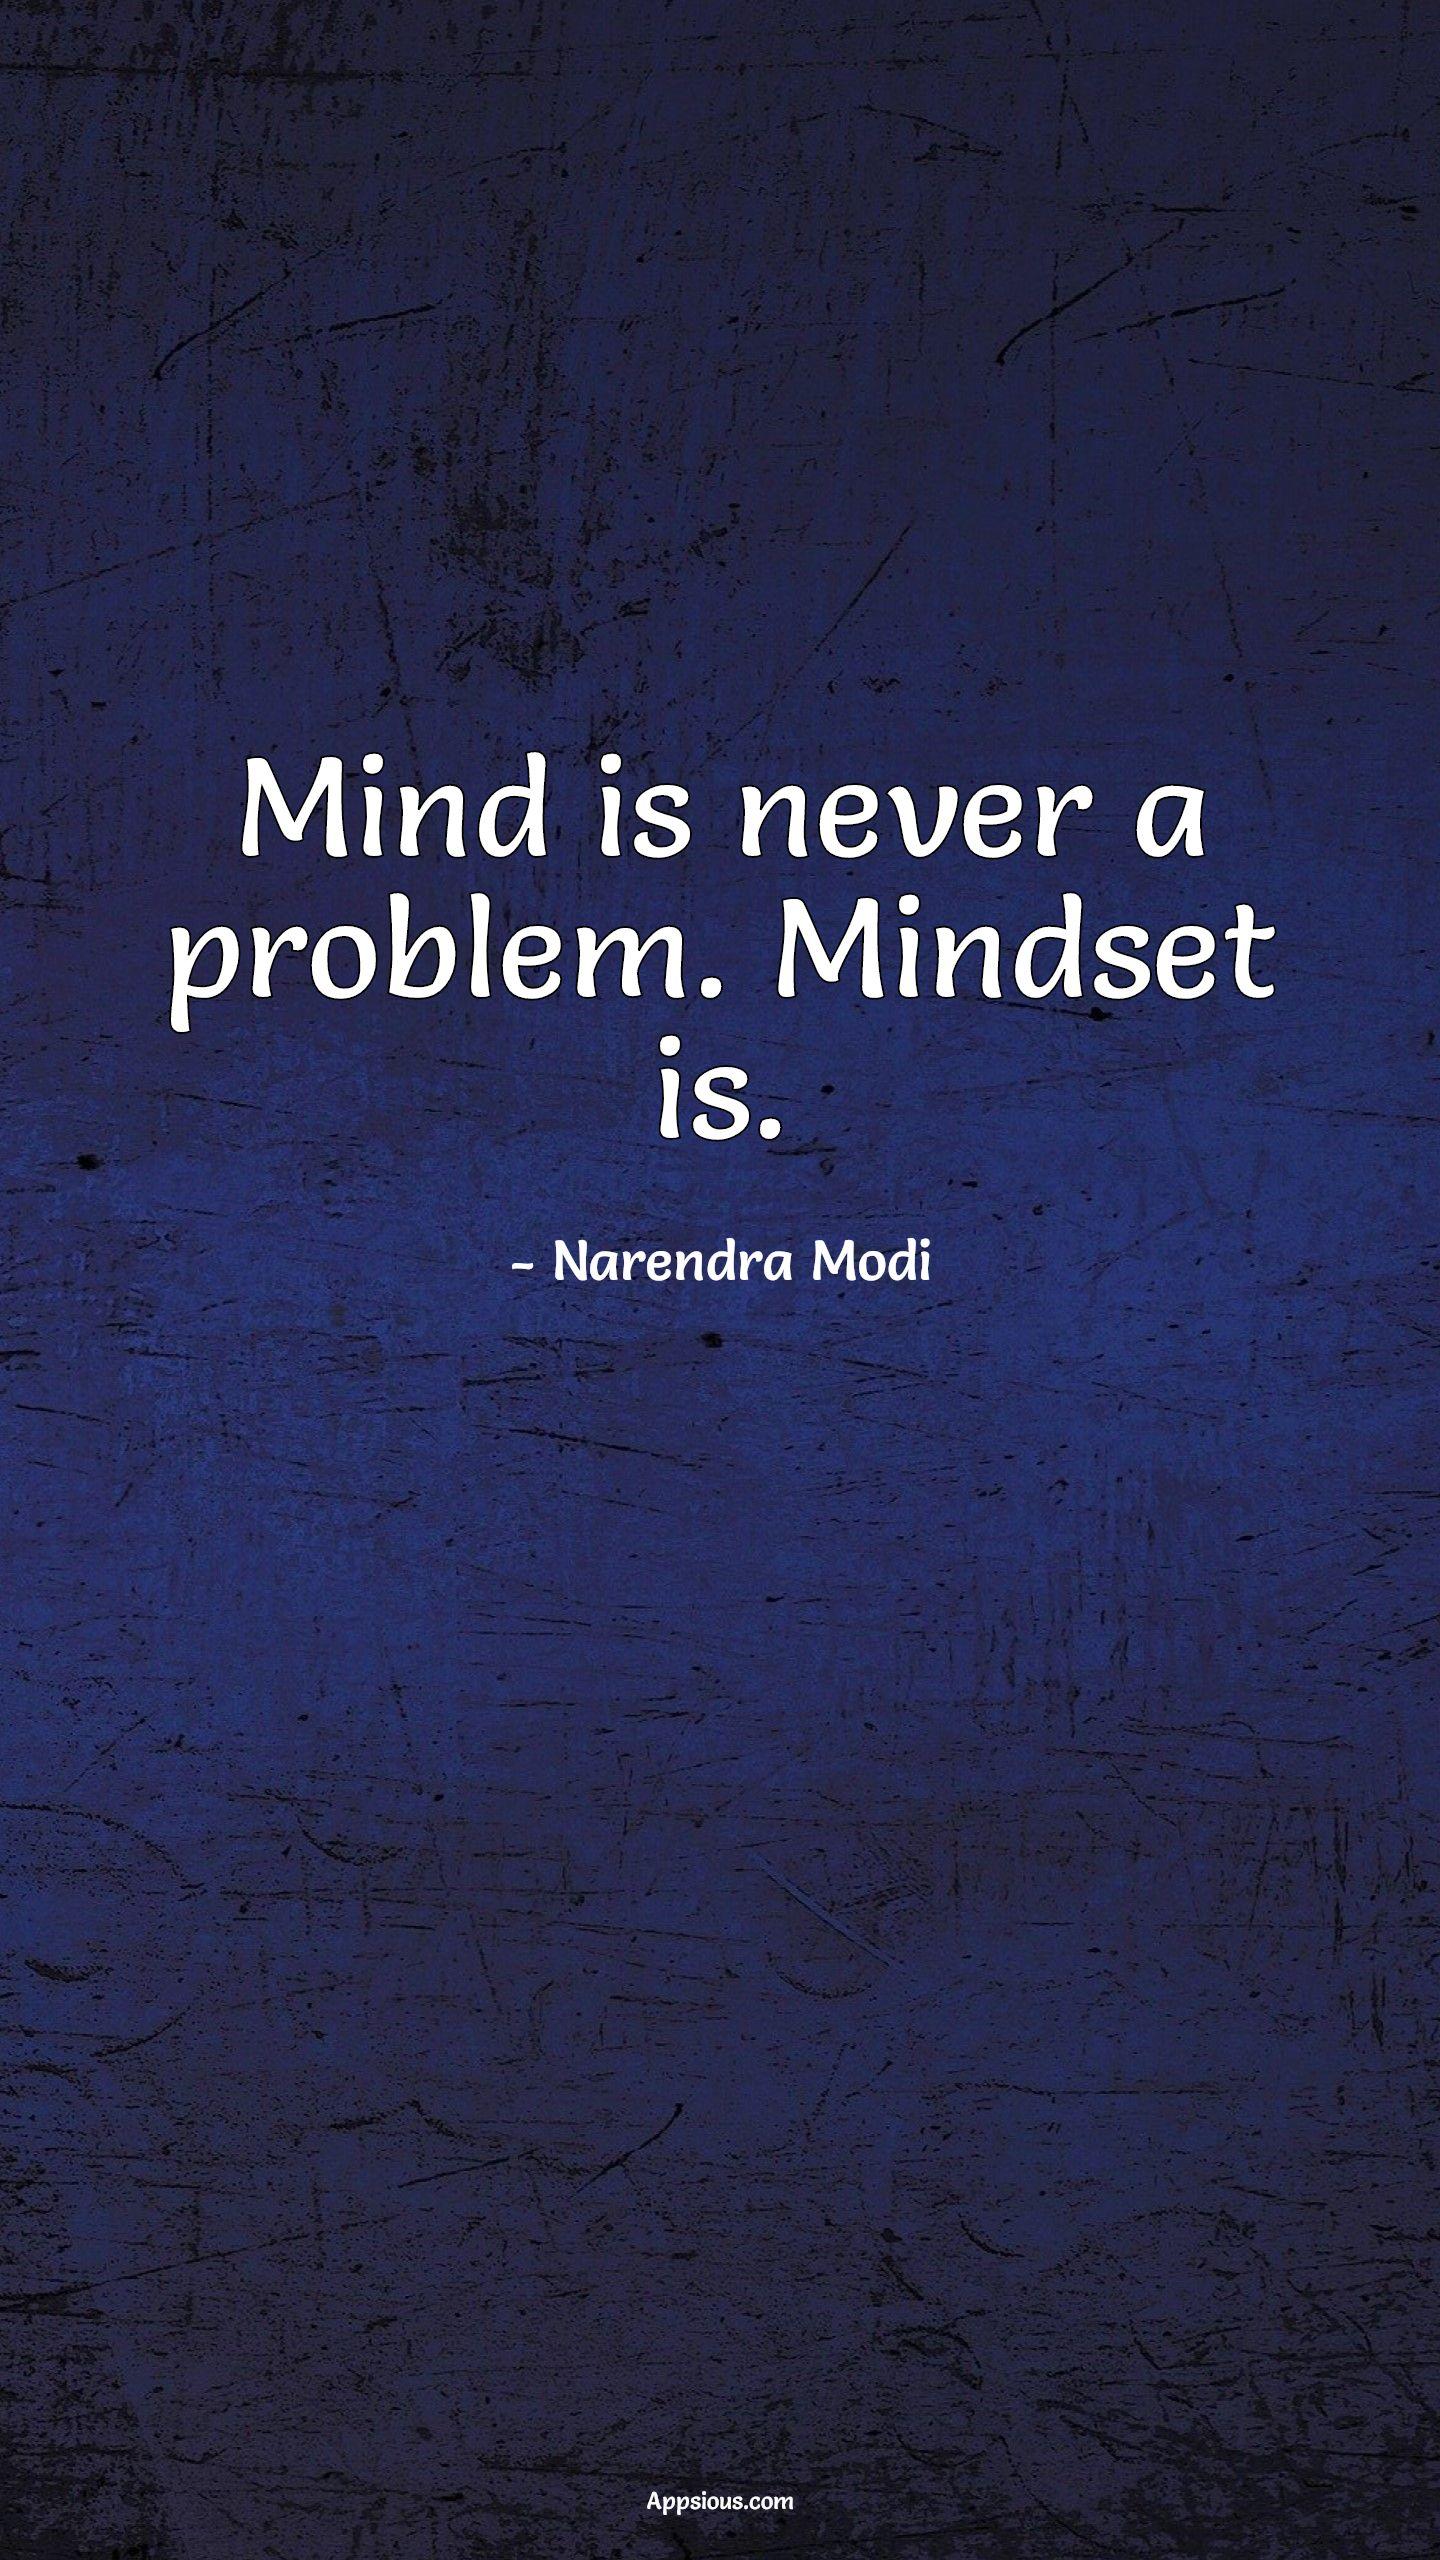 Mind is never a problem. Mindset is.